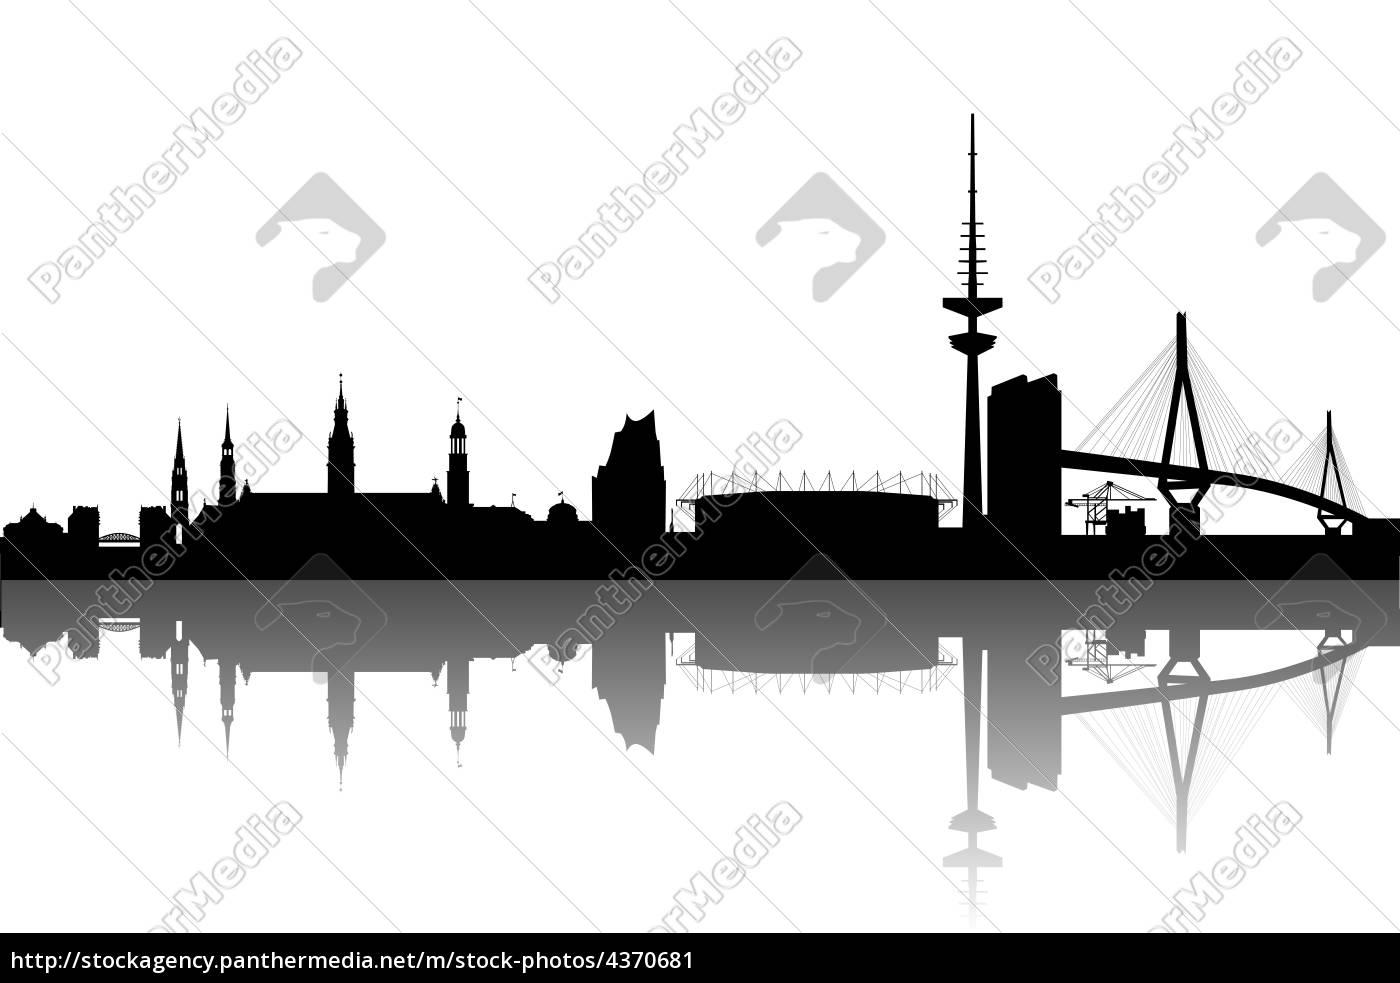 hamburg silhouette abstrakt lizenzfreies bild 4370681. Black Bedroom Furniture Sets. Home Design Ideas